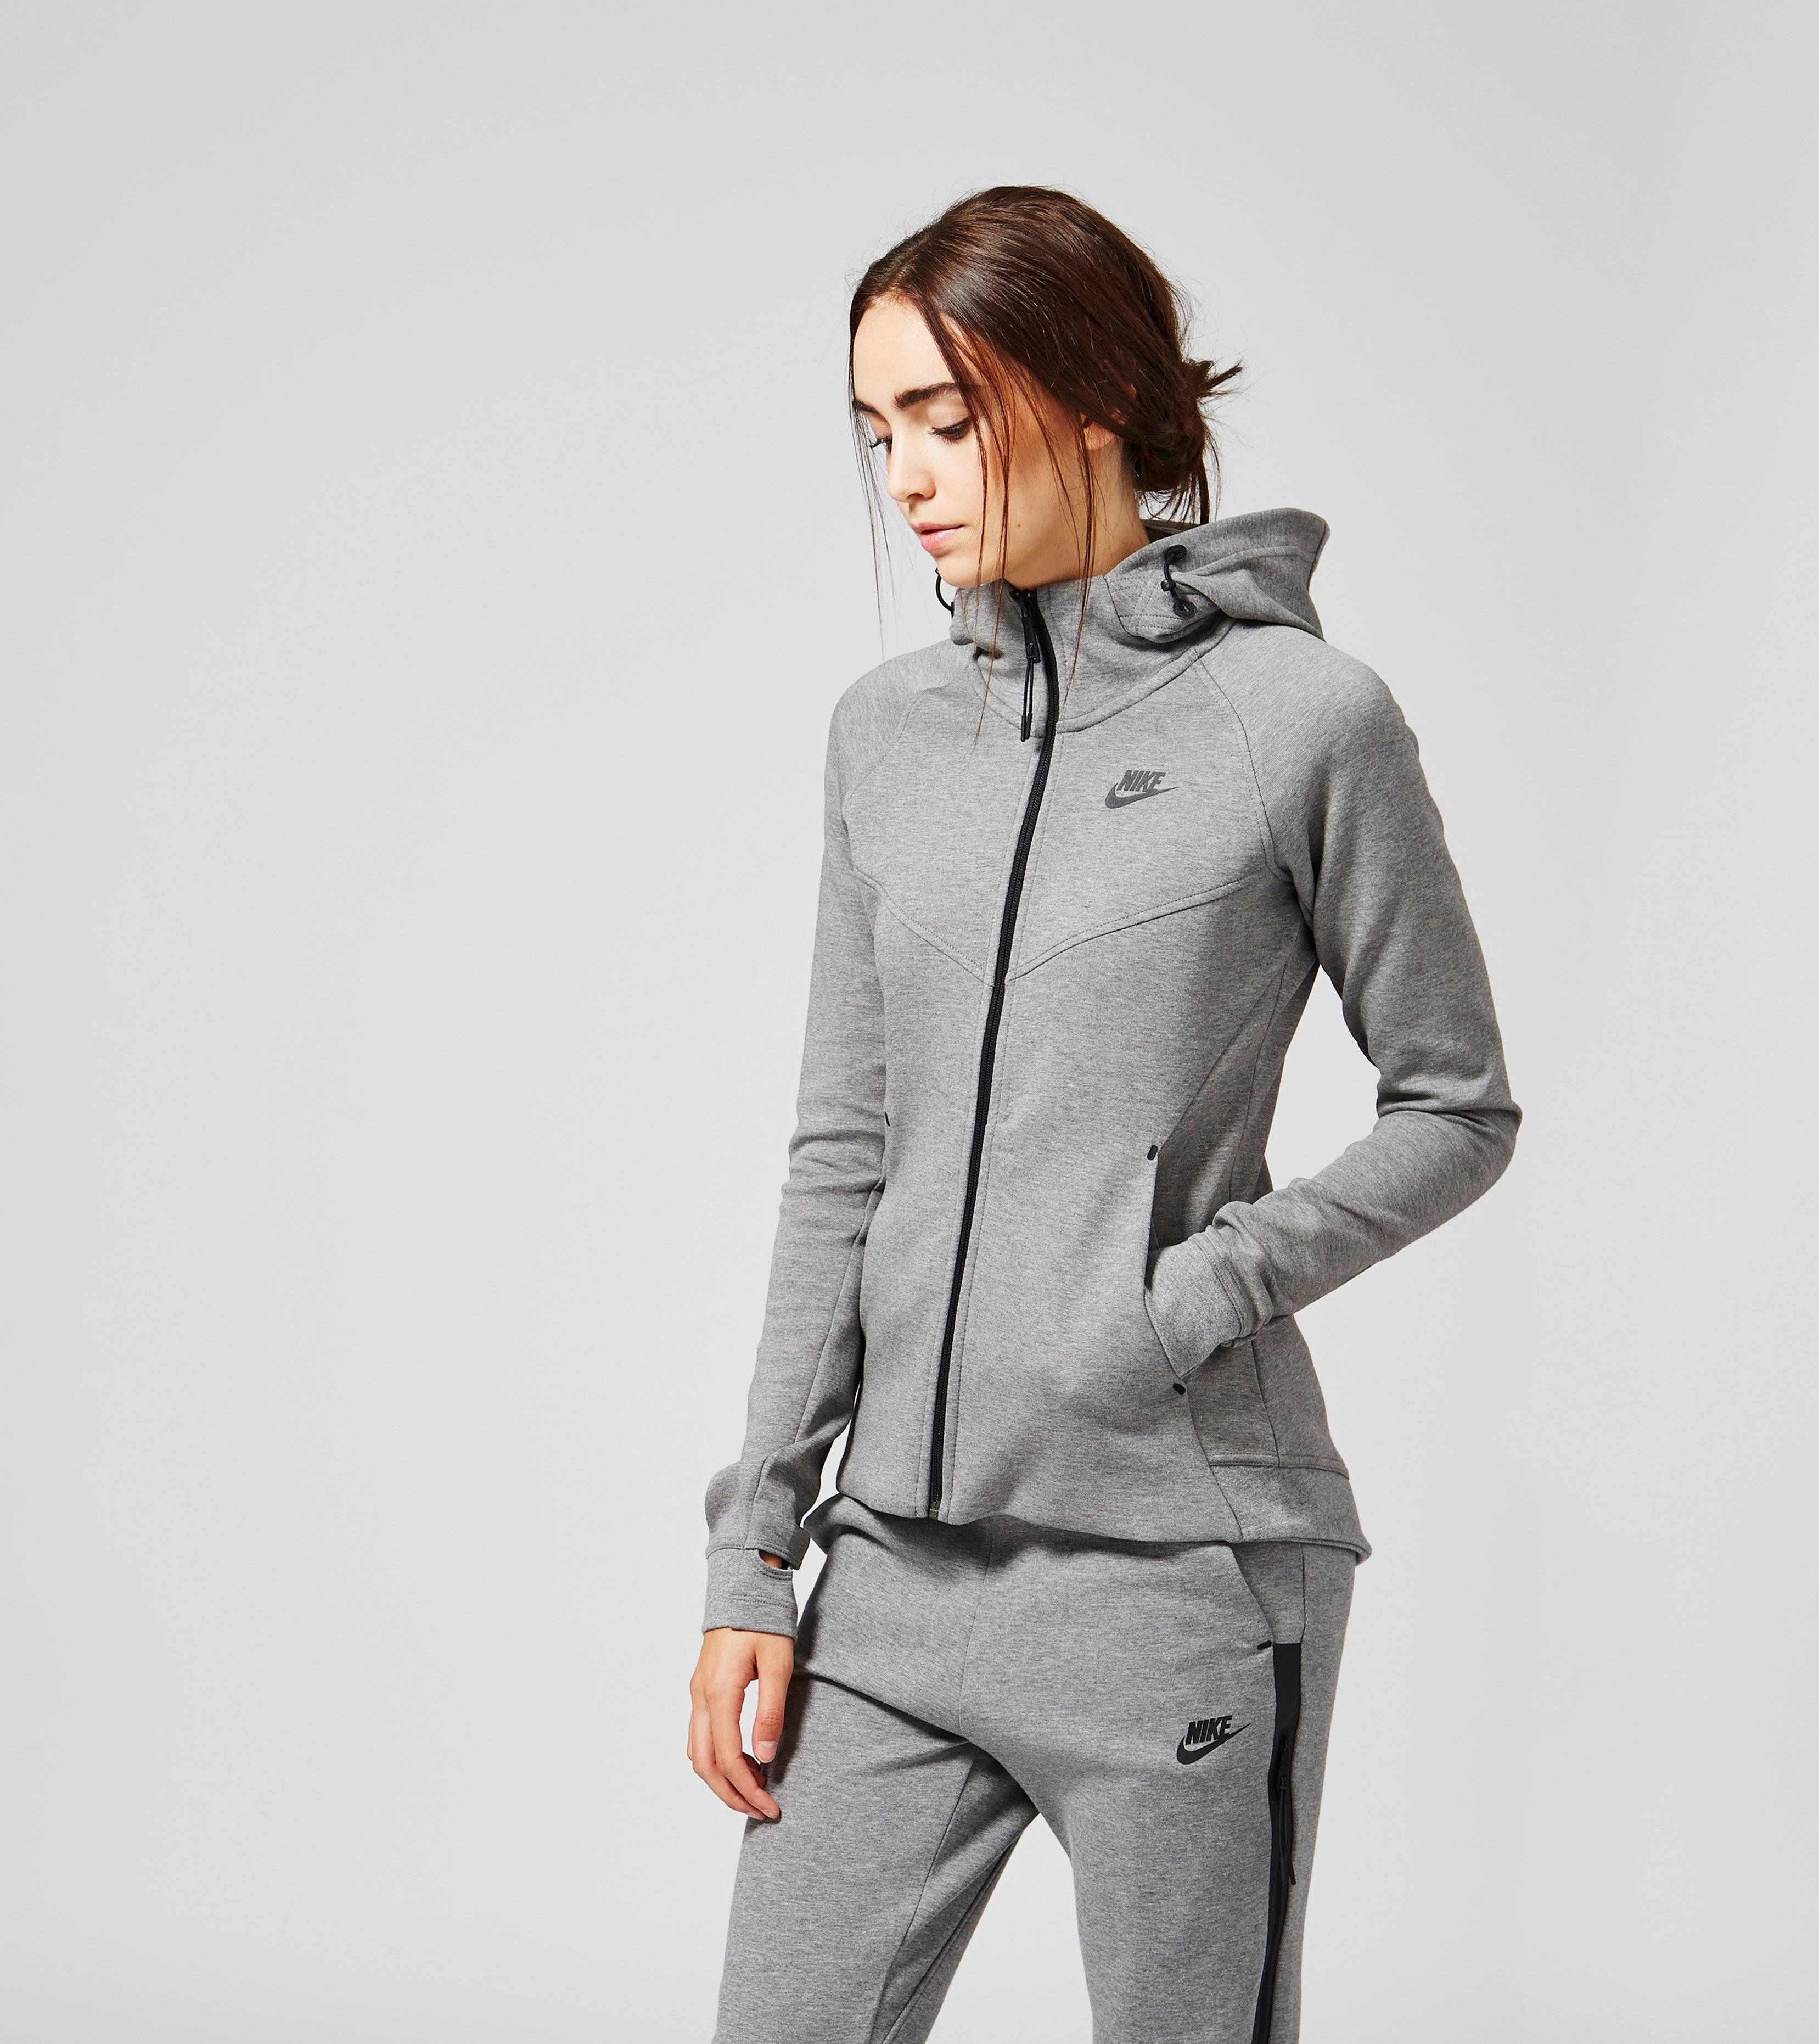 Nike Tech Fleece Zip Hoody Size? Nike tech fleece